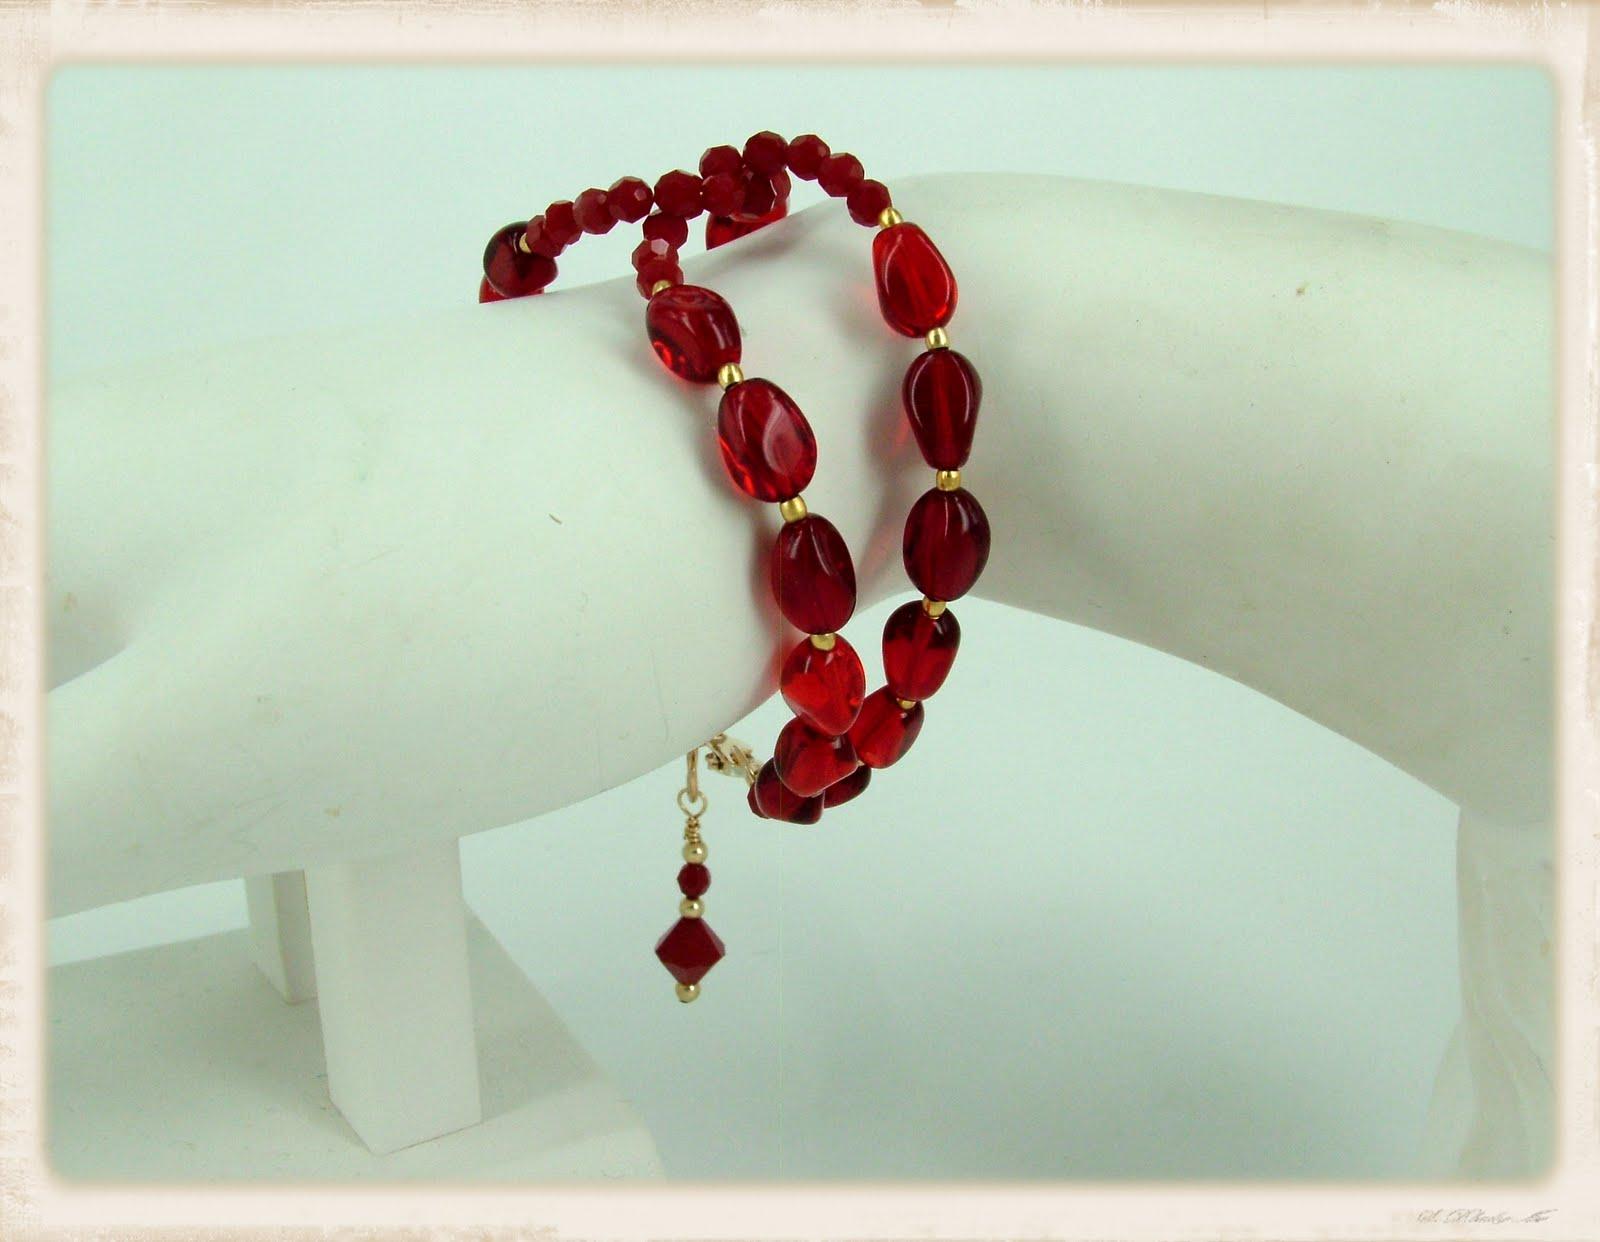 Melissa Ingram Beadwork: Entwined Ruby Red Bracelet